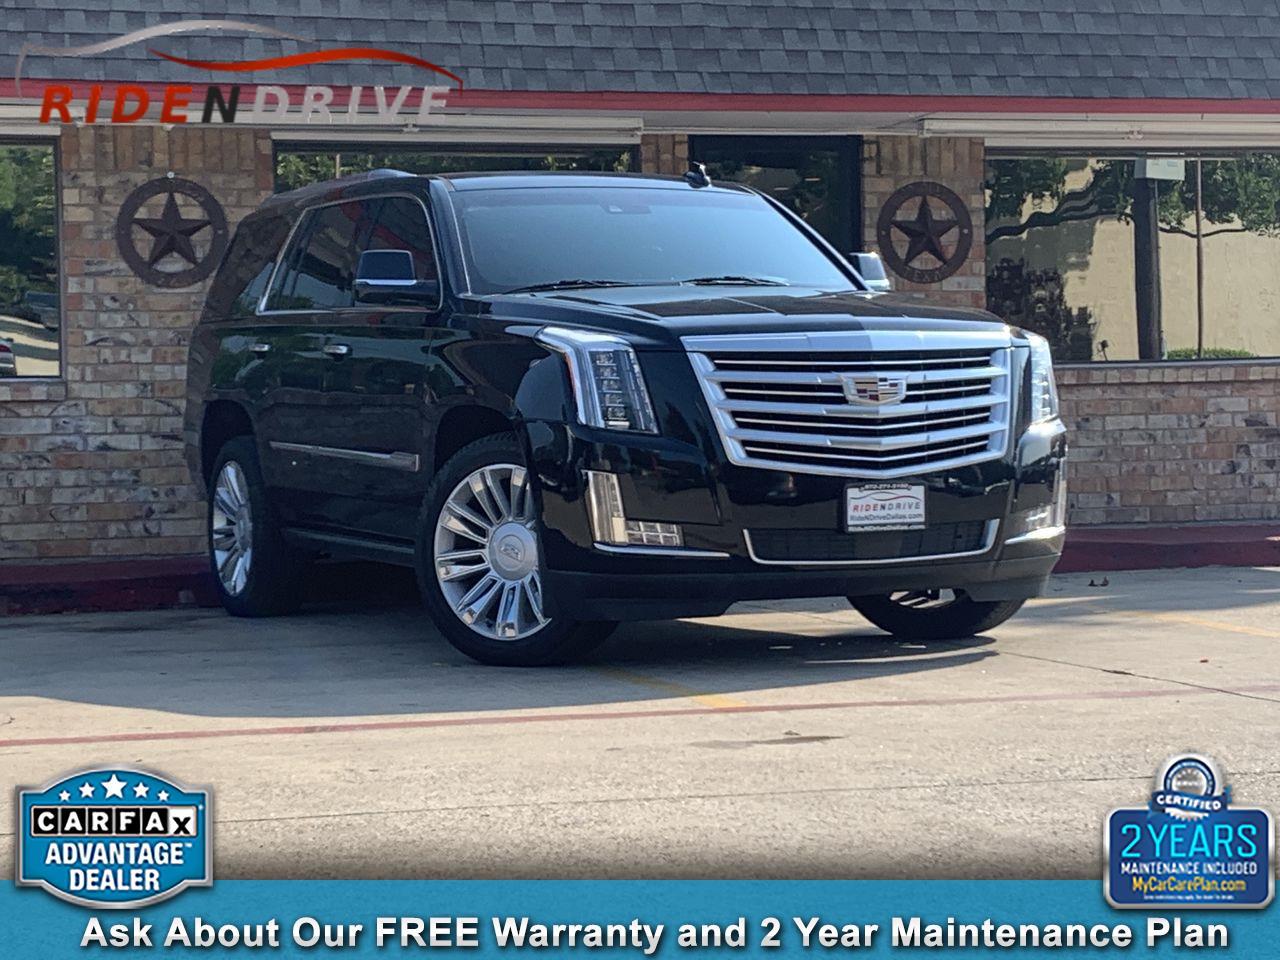 2016 Cadillac Escalade 4WD 4dr Platinum